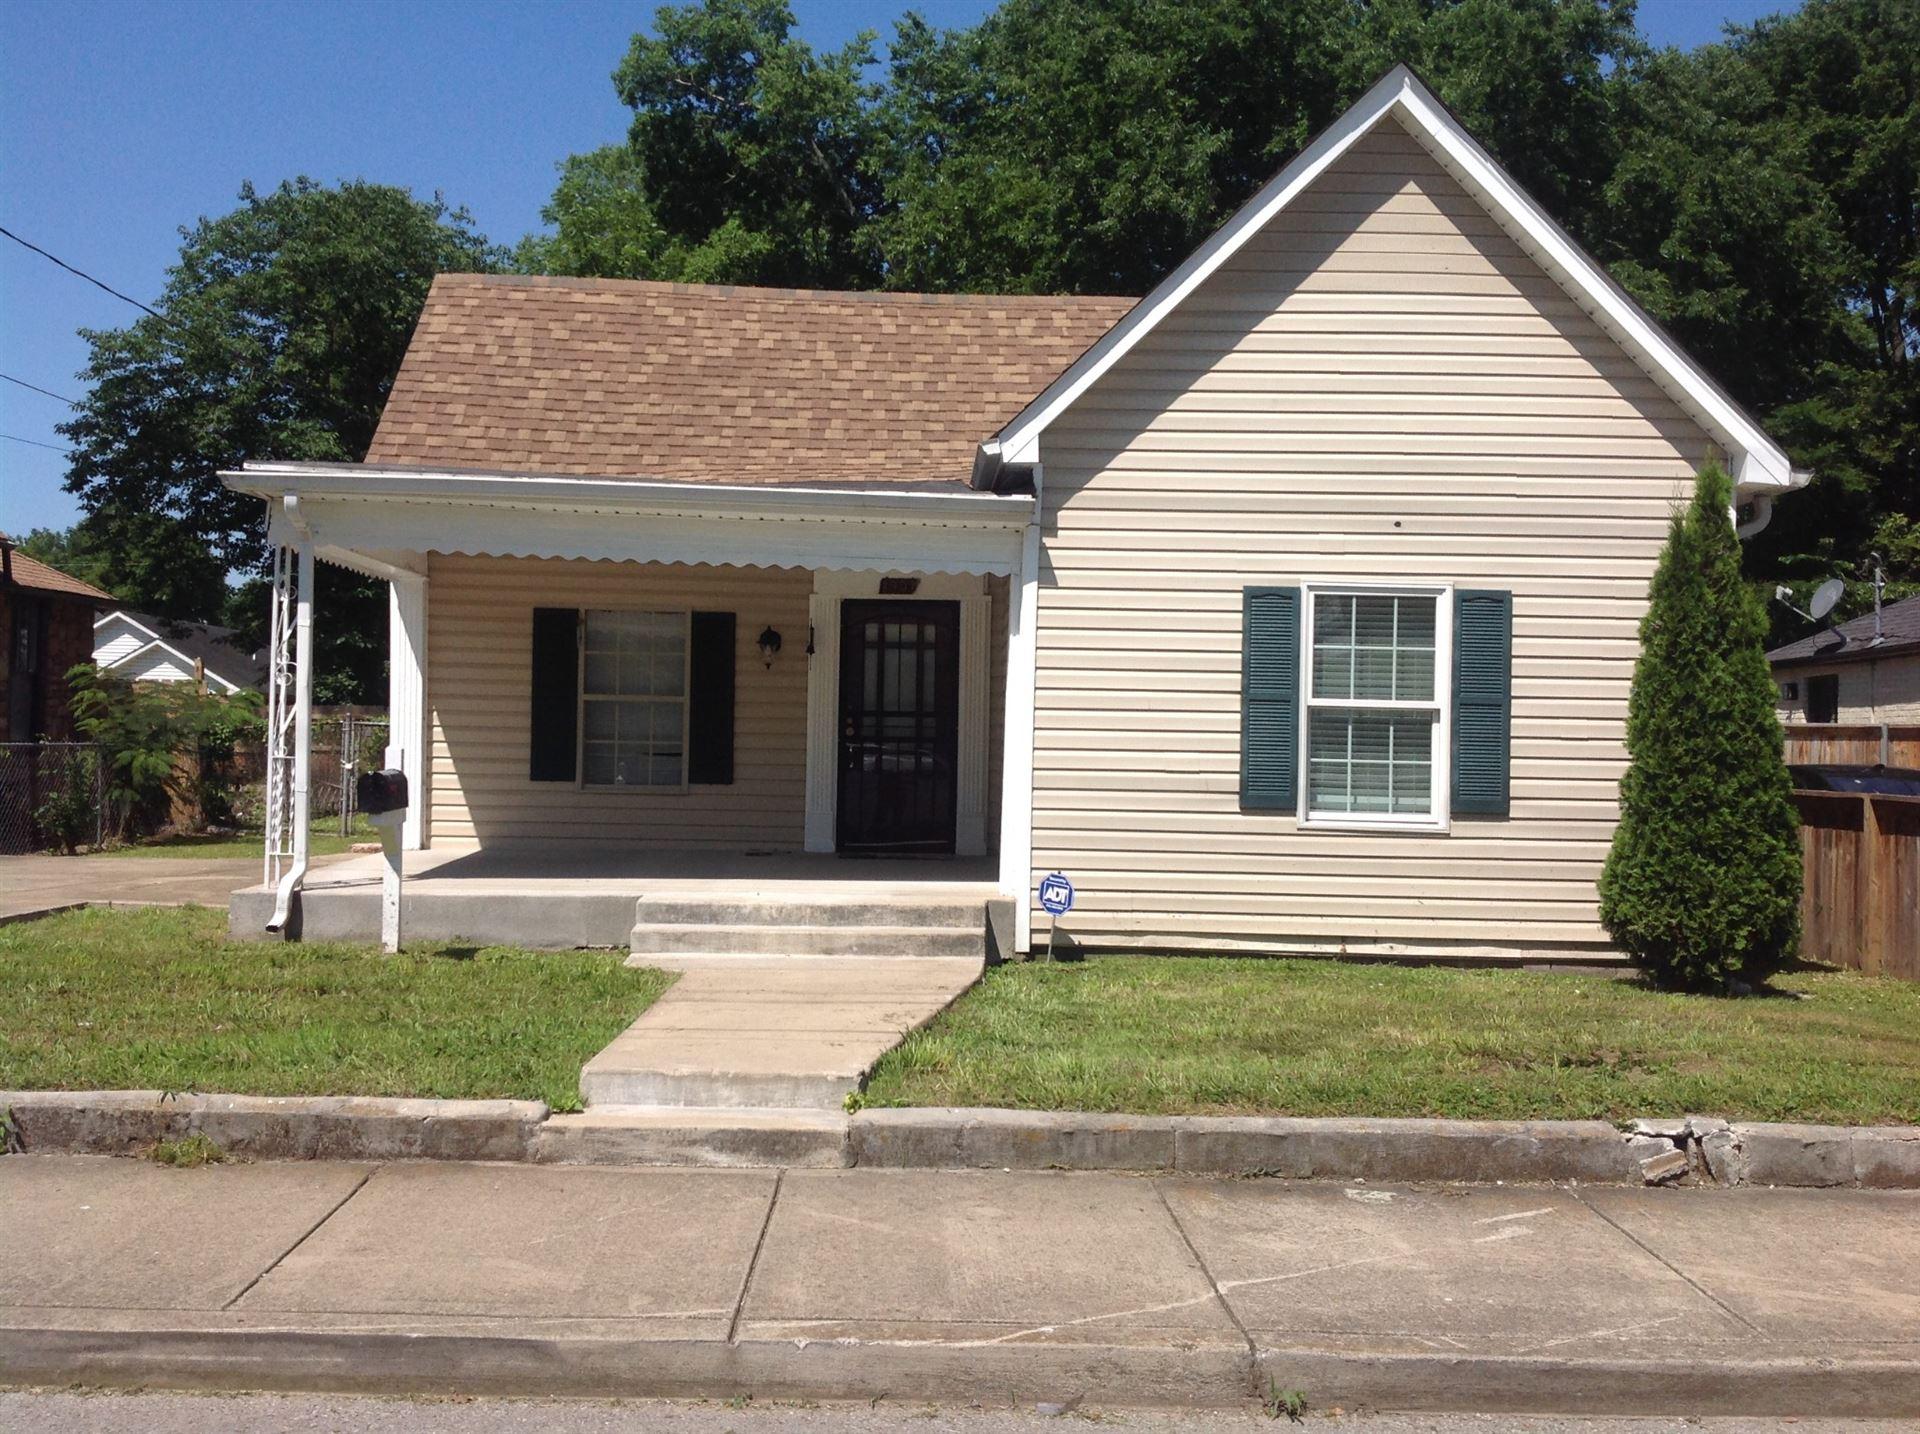 1907 12th Ave N, Nashville, TN 37208 - MLS#: 2263368